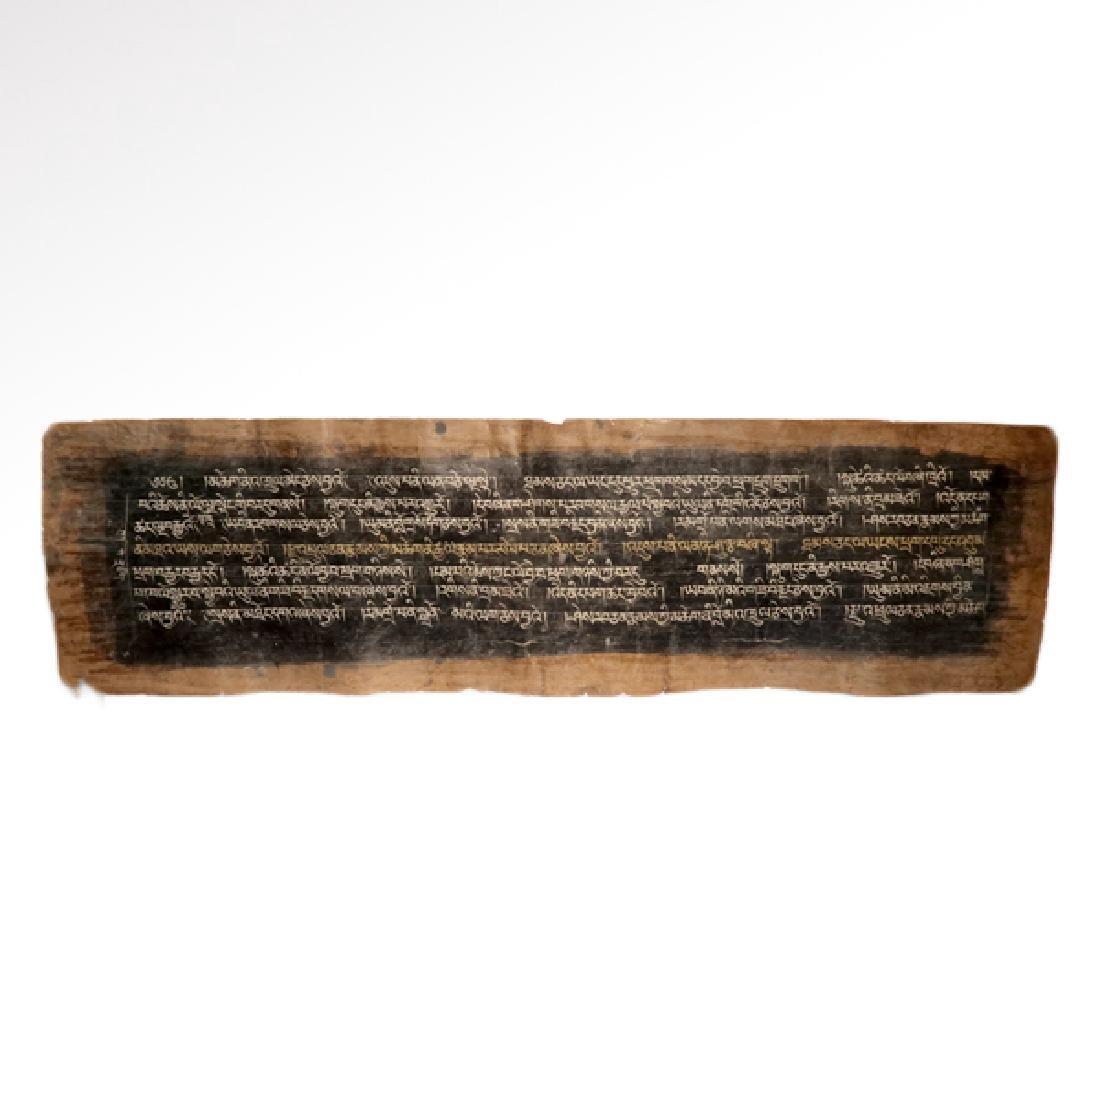 Tibetan Sutra Manuscript, c. 17th Century A.D. - 6